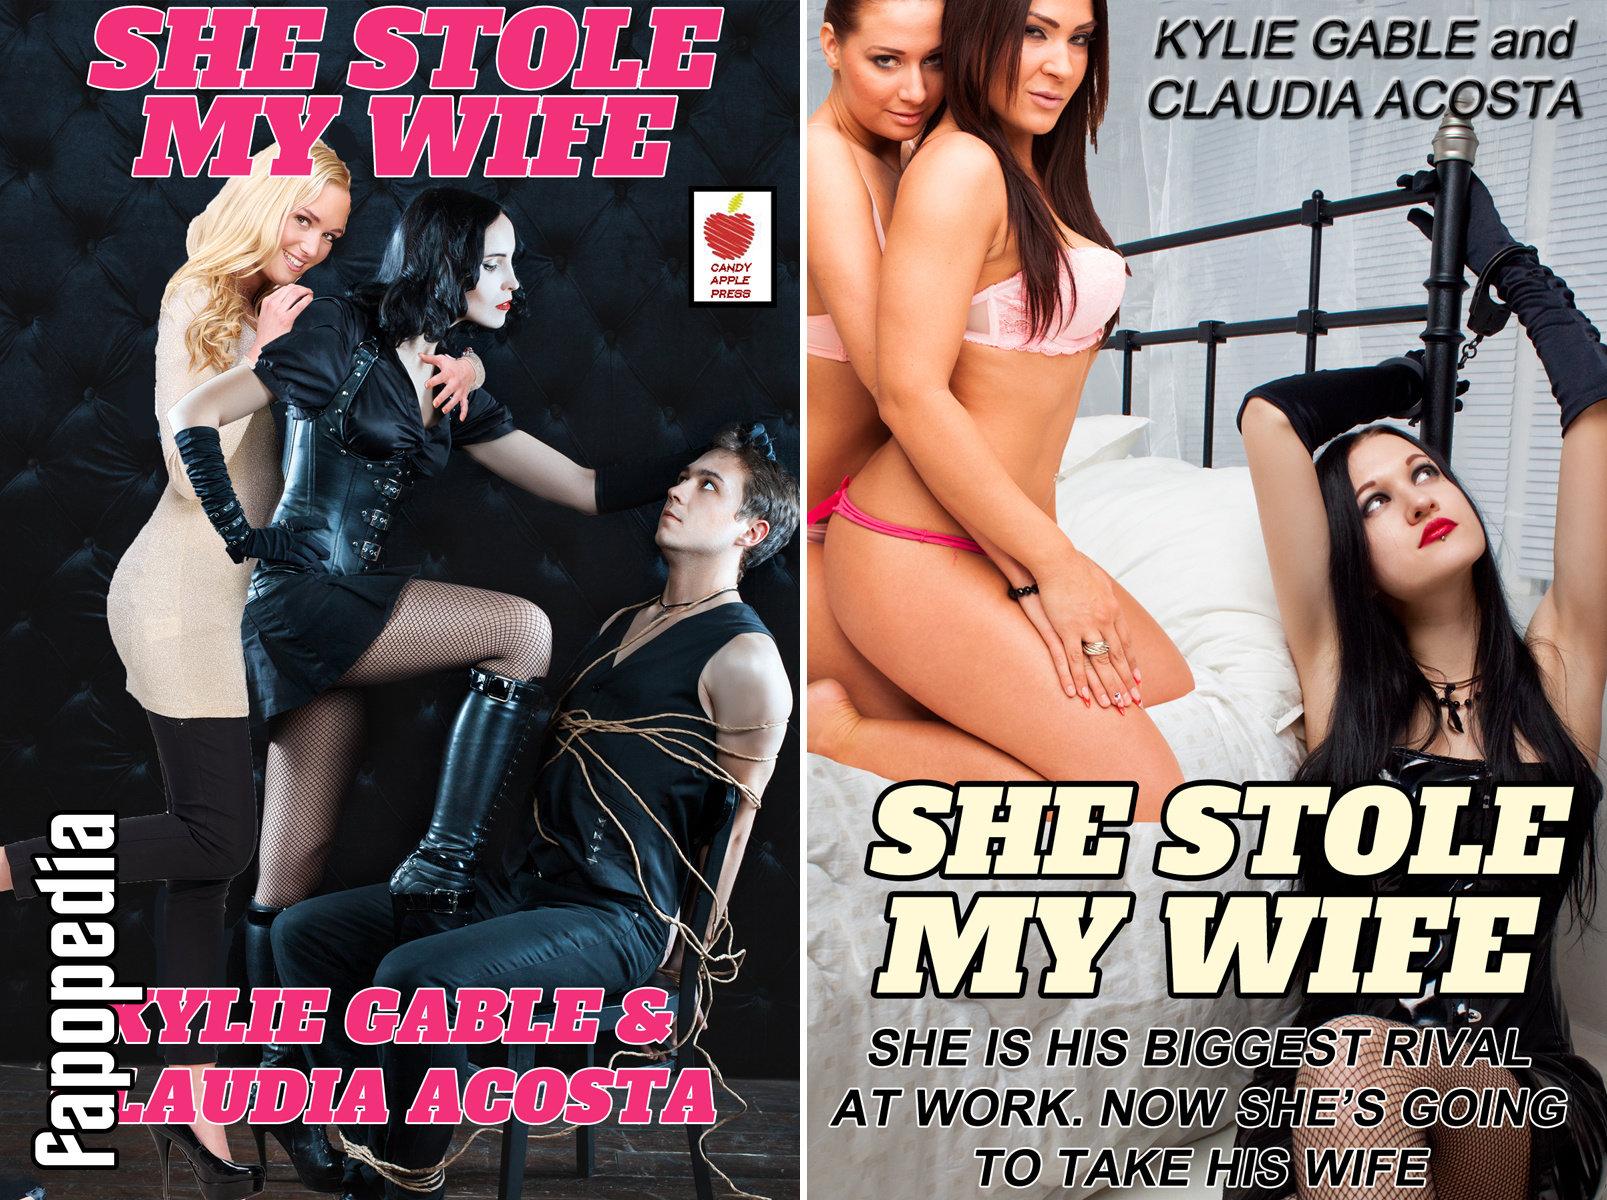 KylieGable Nude Patreon Leaks